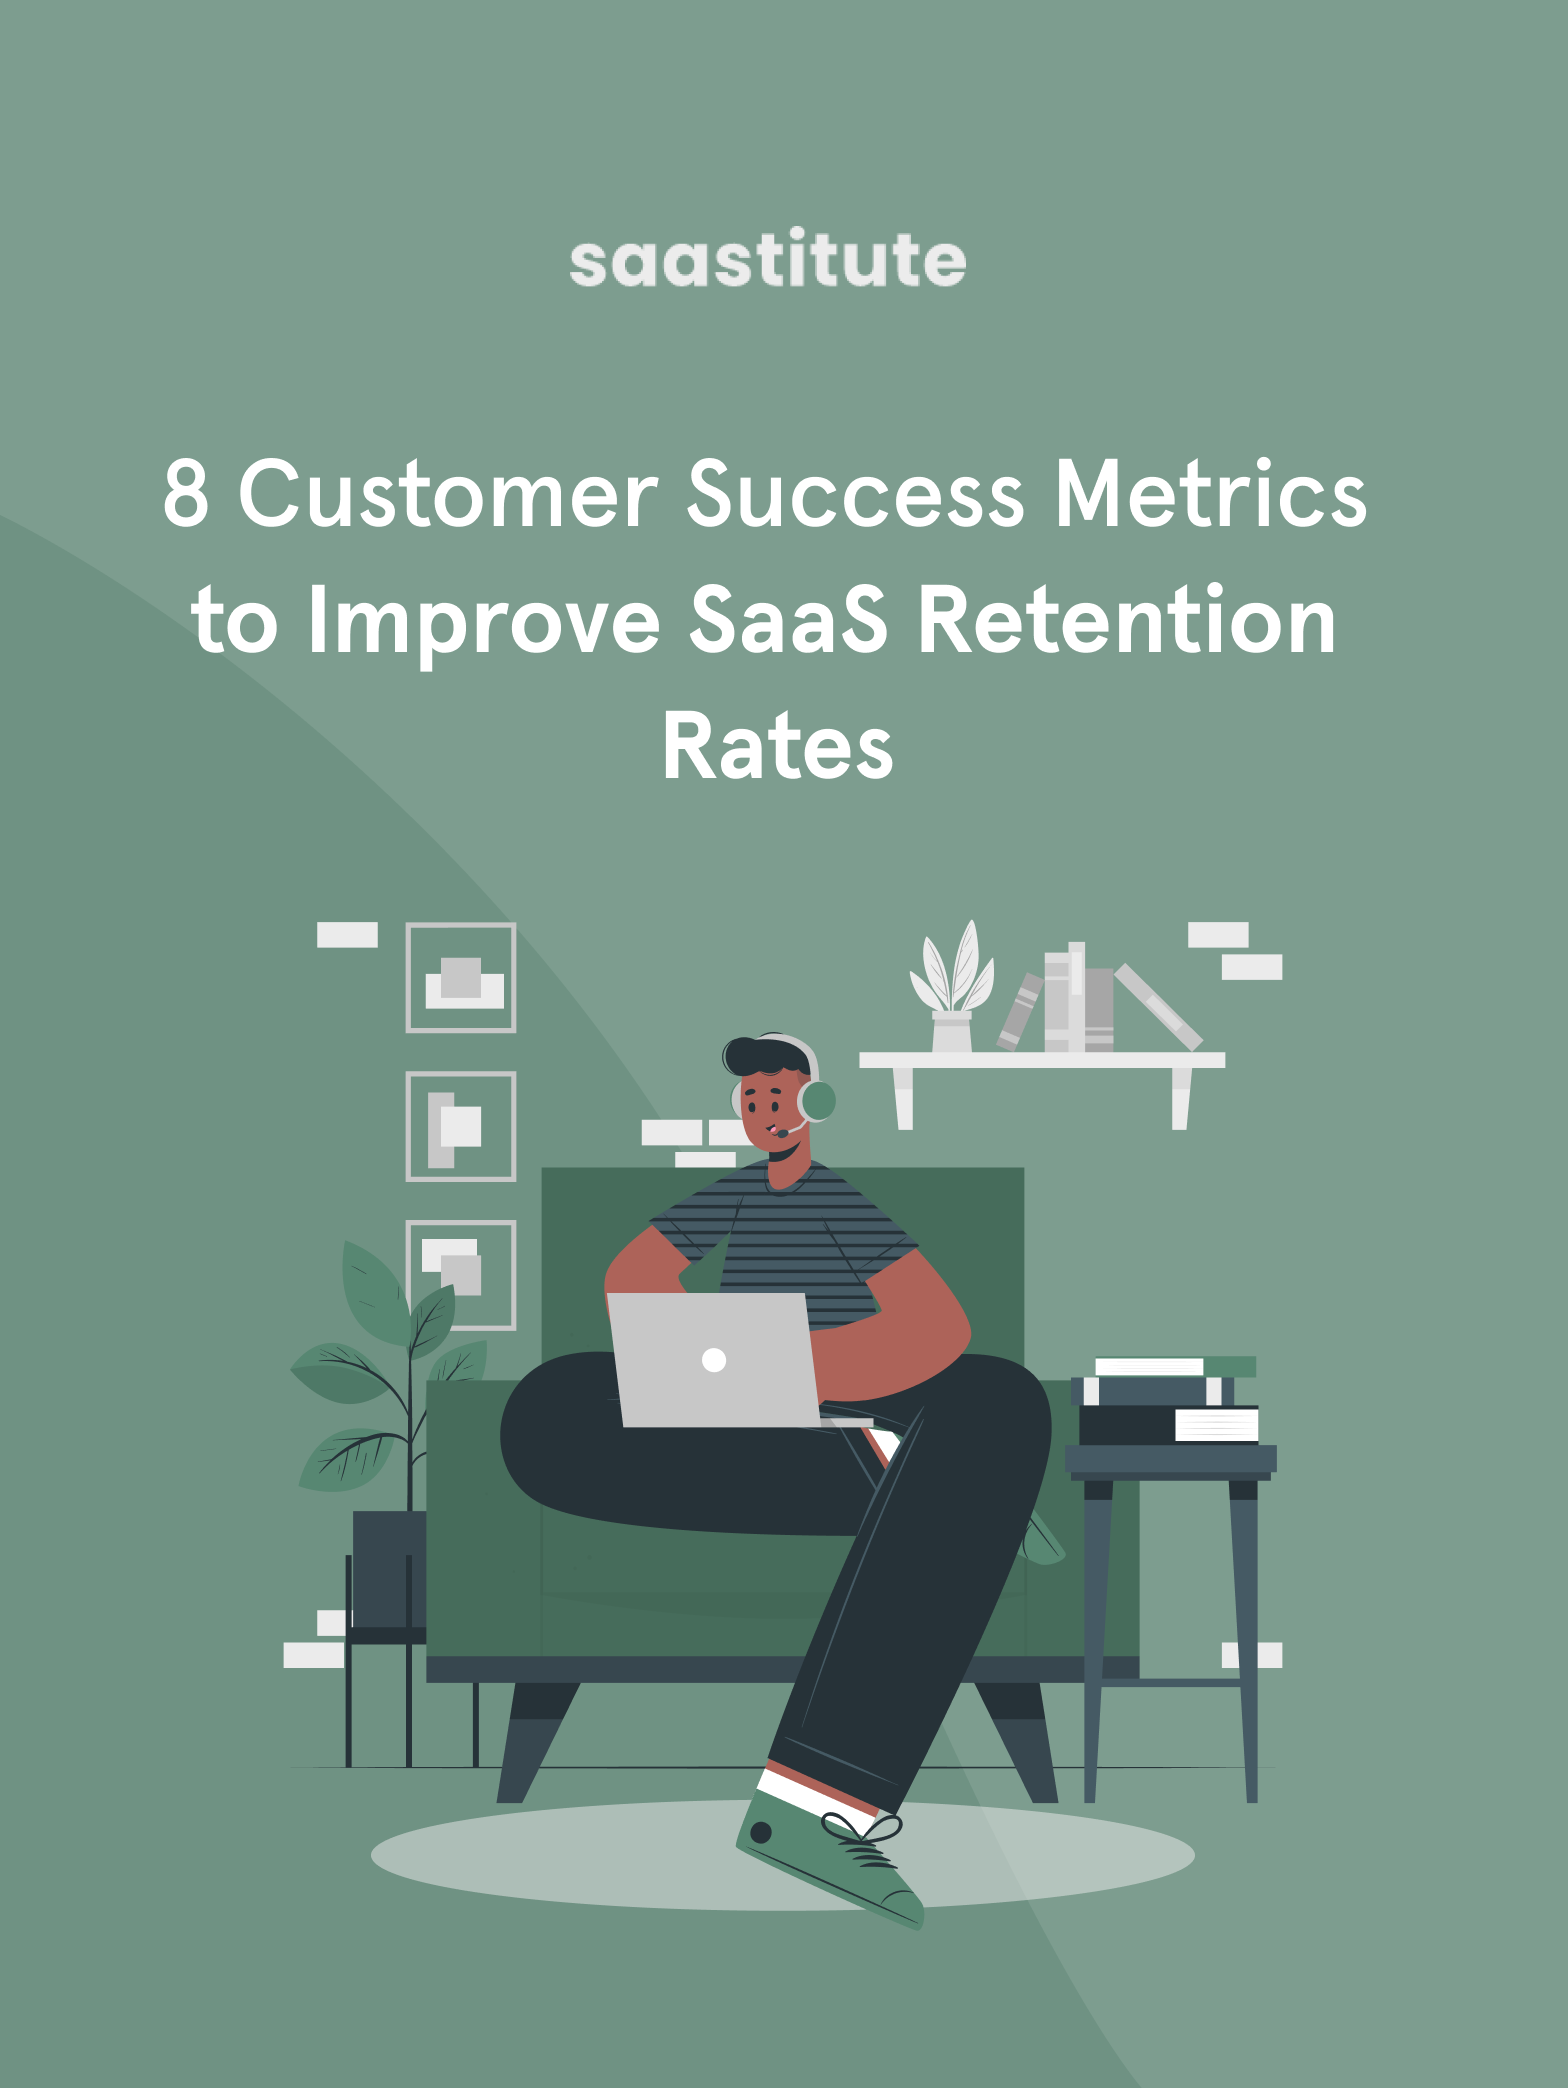 8 Customer Success Metrics to Improve your SaaS Retention